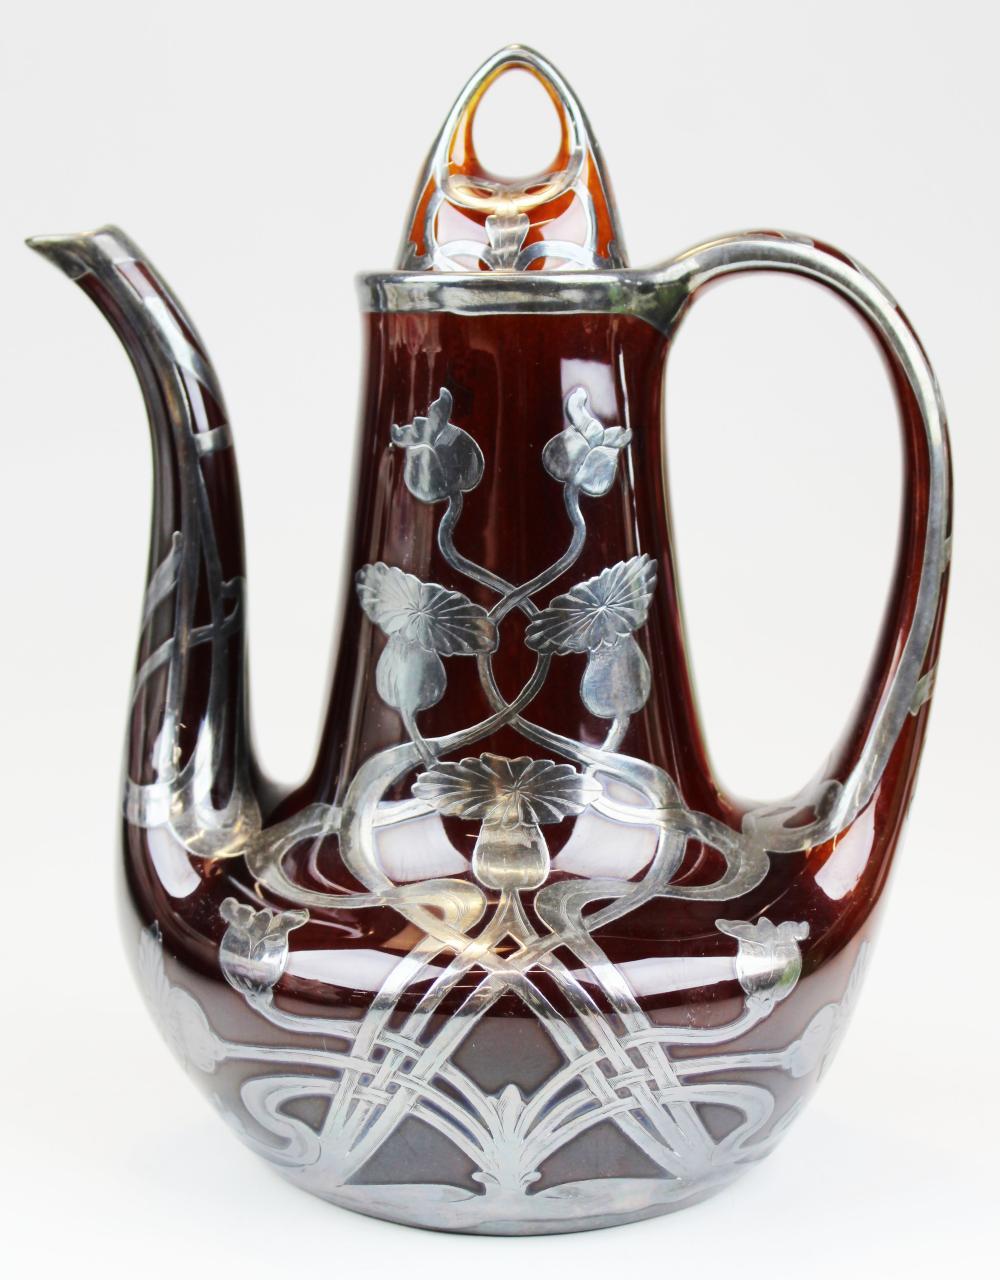 Lenox art nouveau sterling overlay teapot